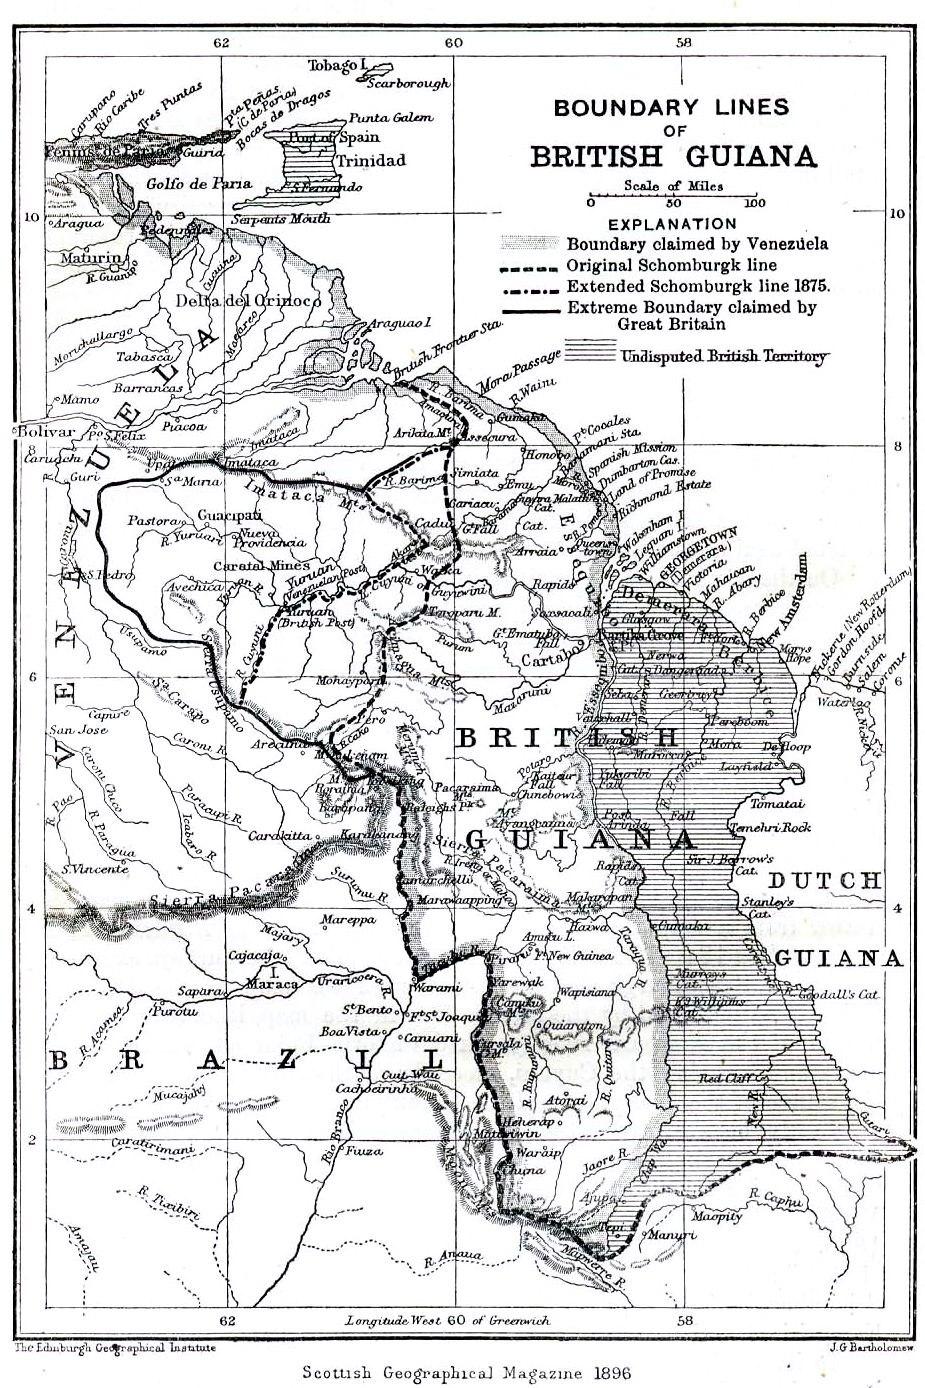 Boundary lines of British Guiana 1896